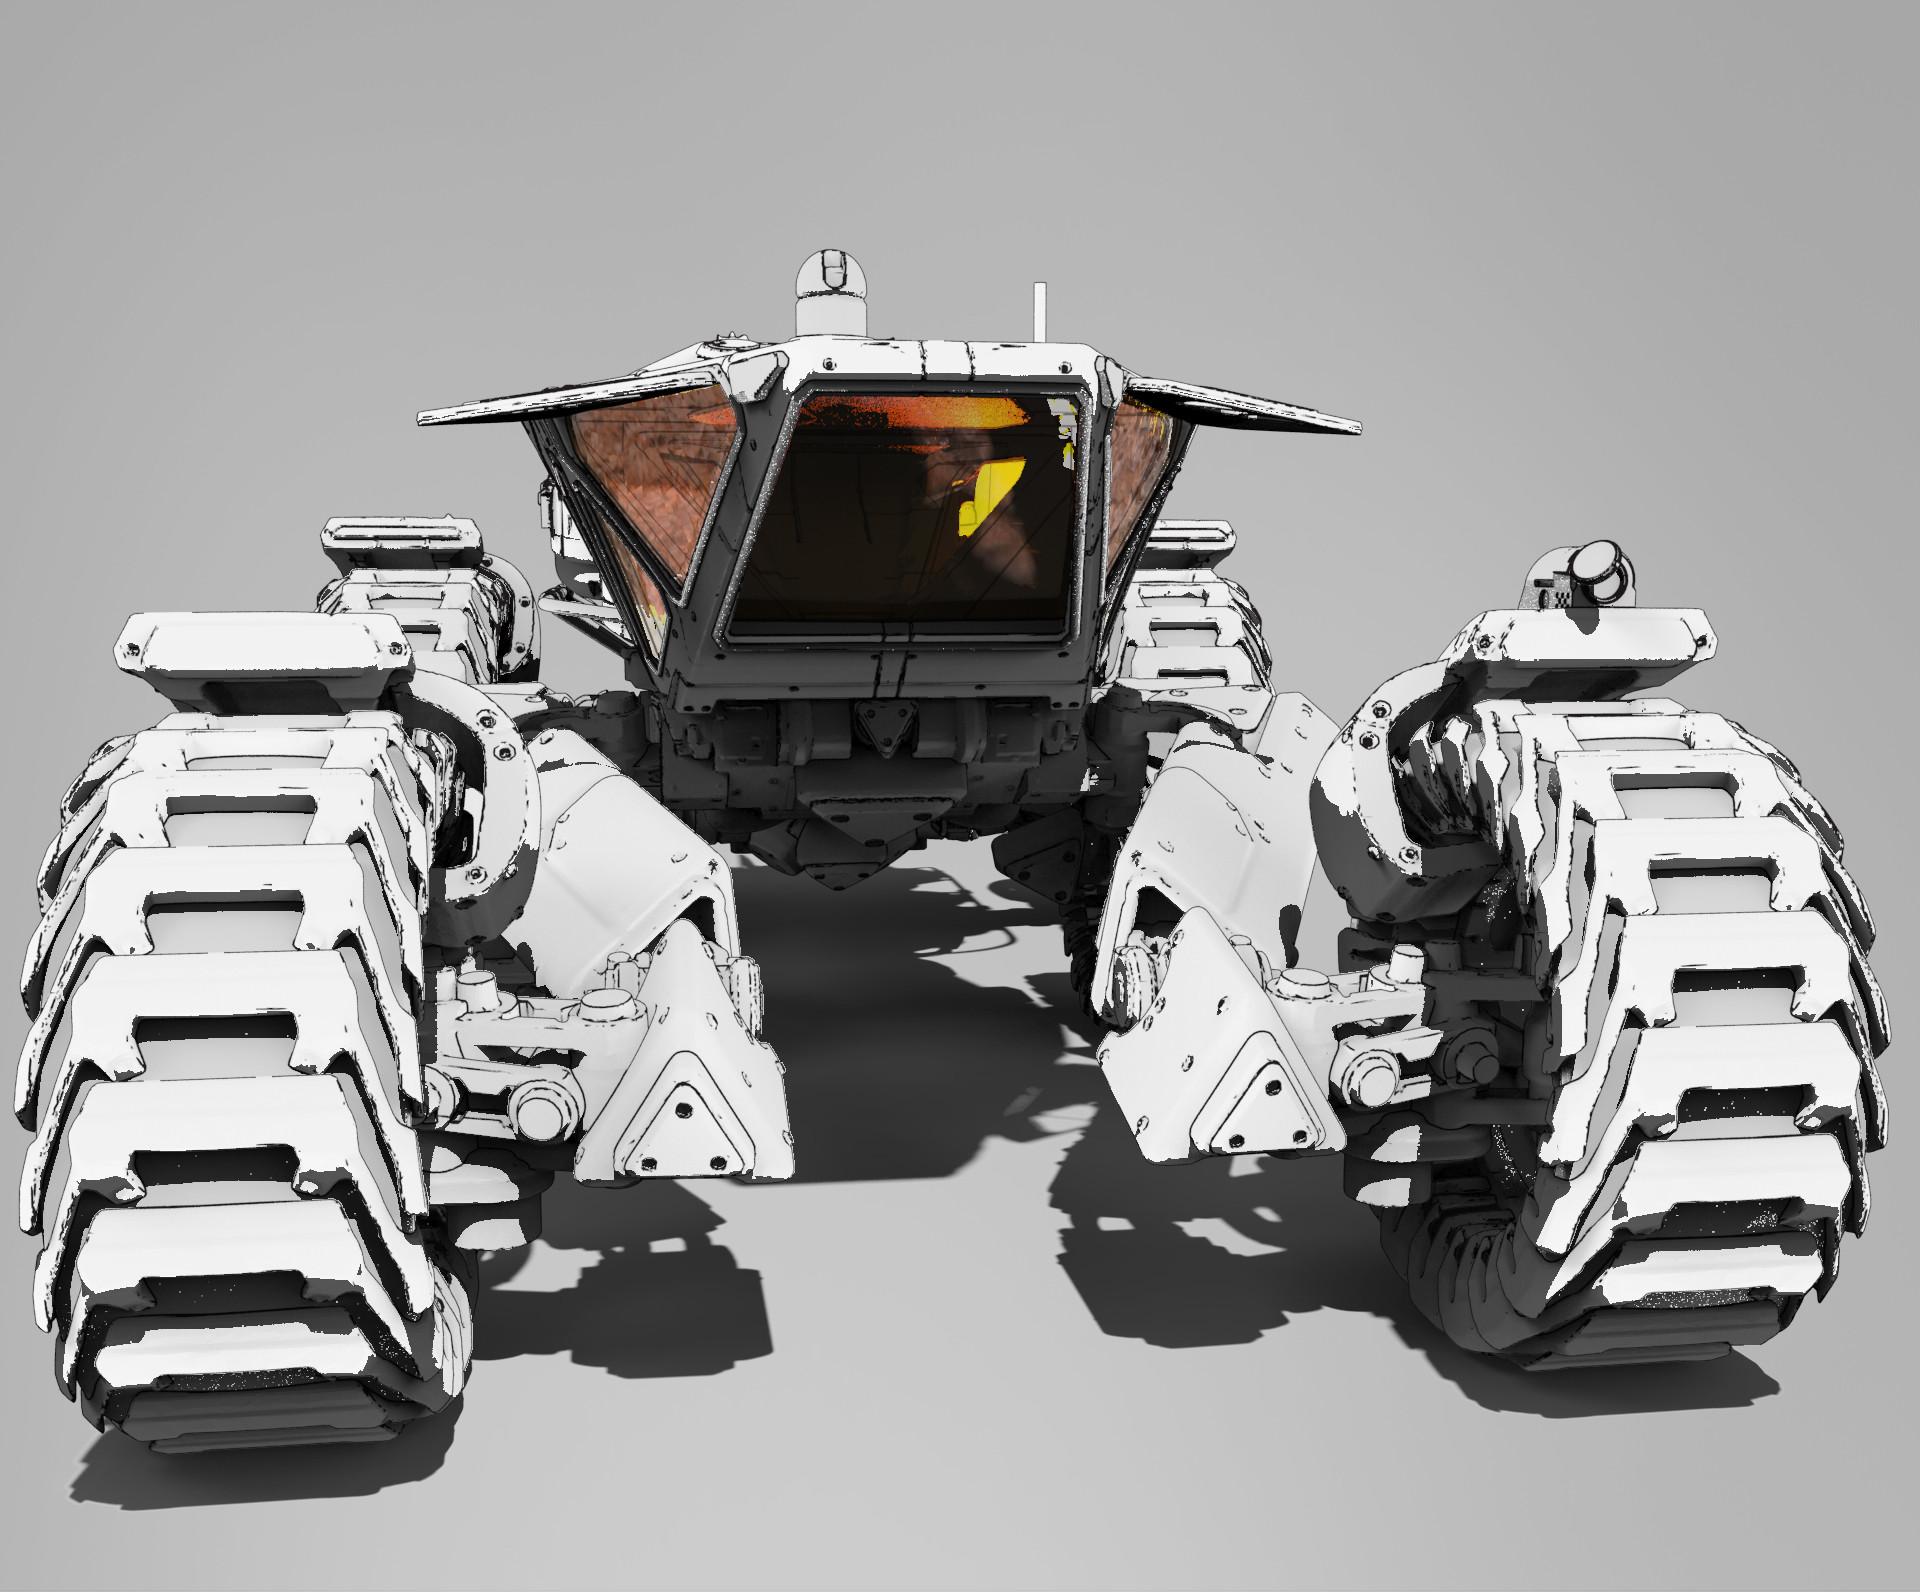 Roberto robert mars buggy kitbash 58